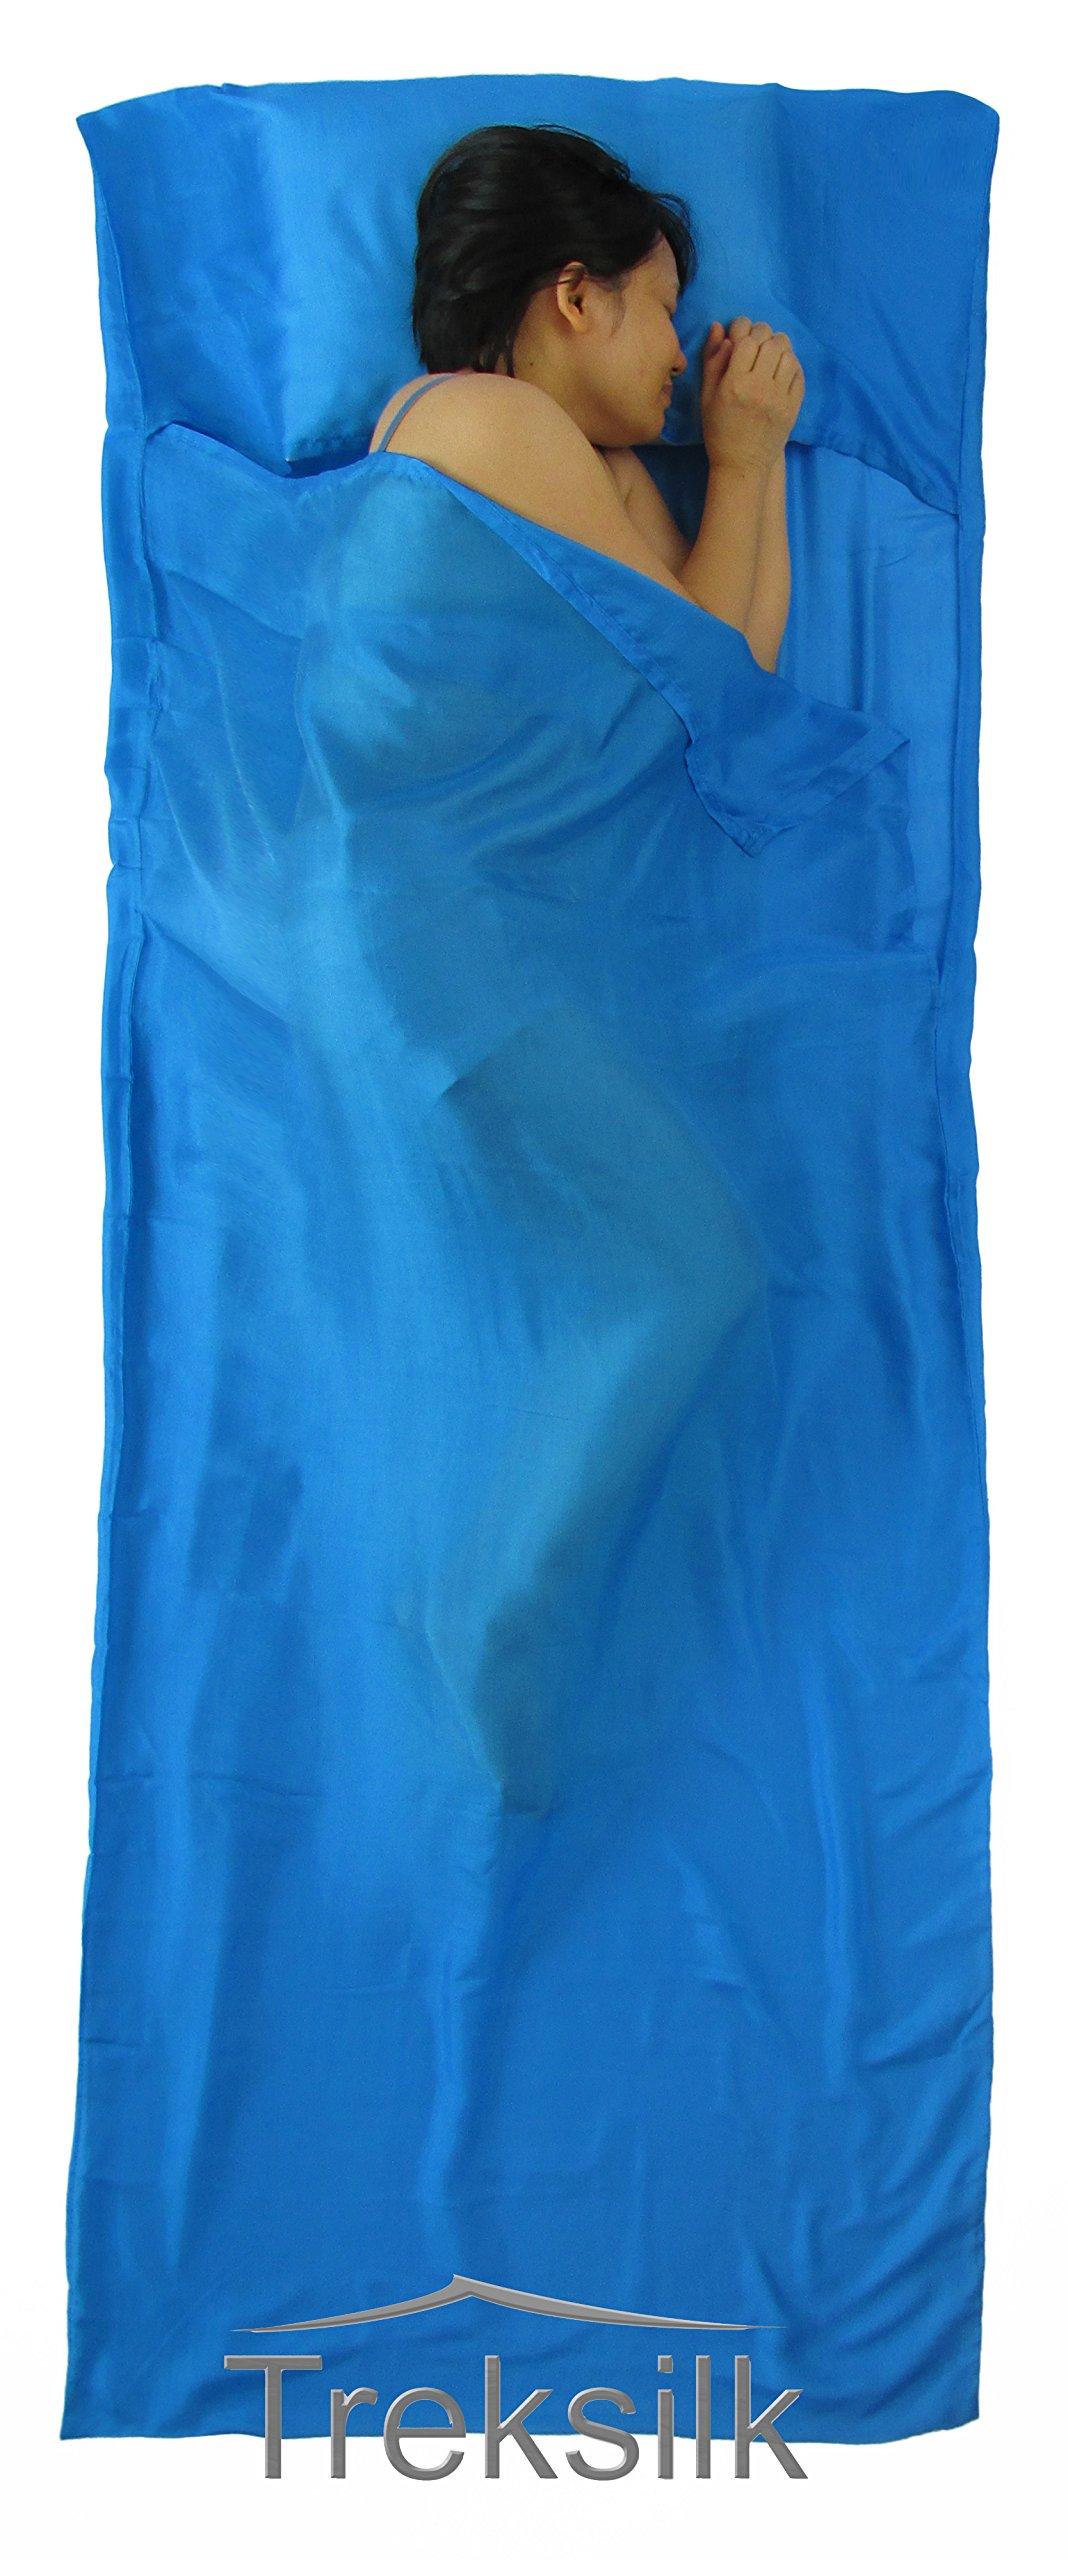 Treksilk: 240 cm! 100% Mulberry Silk Single Sleeping Bag Liner Travel Sheet Sack (Aqua Blue) by Treksilk